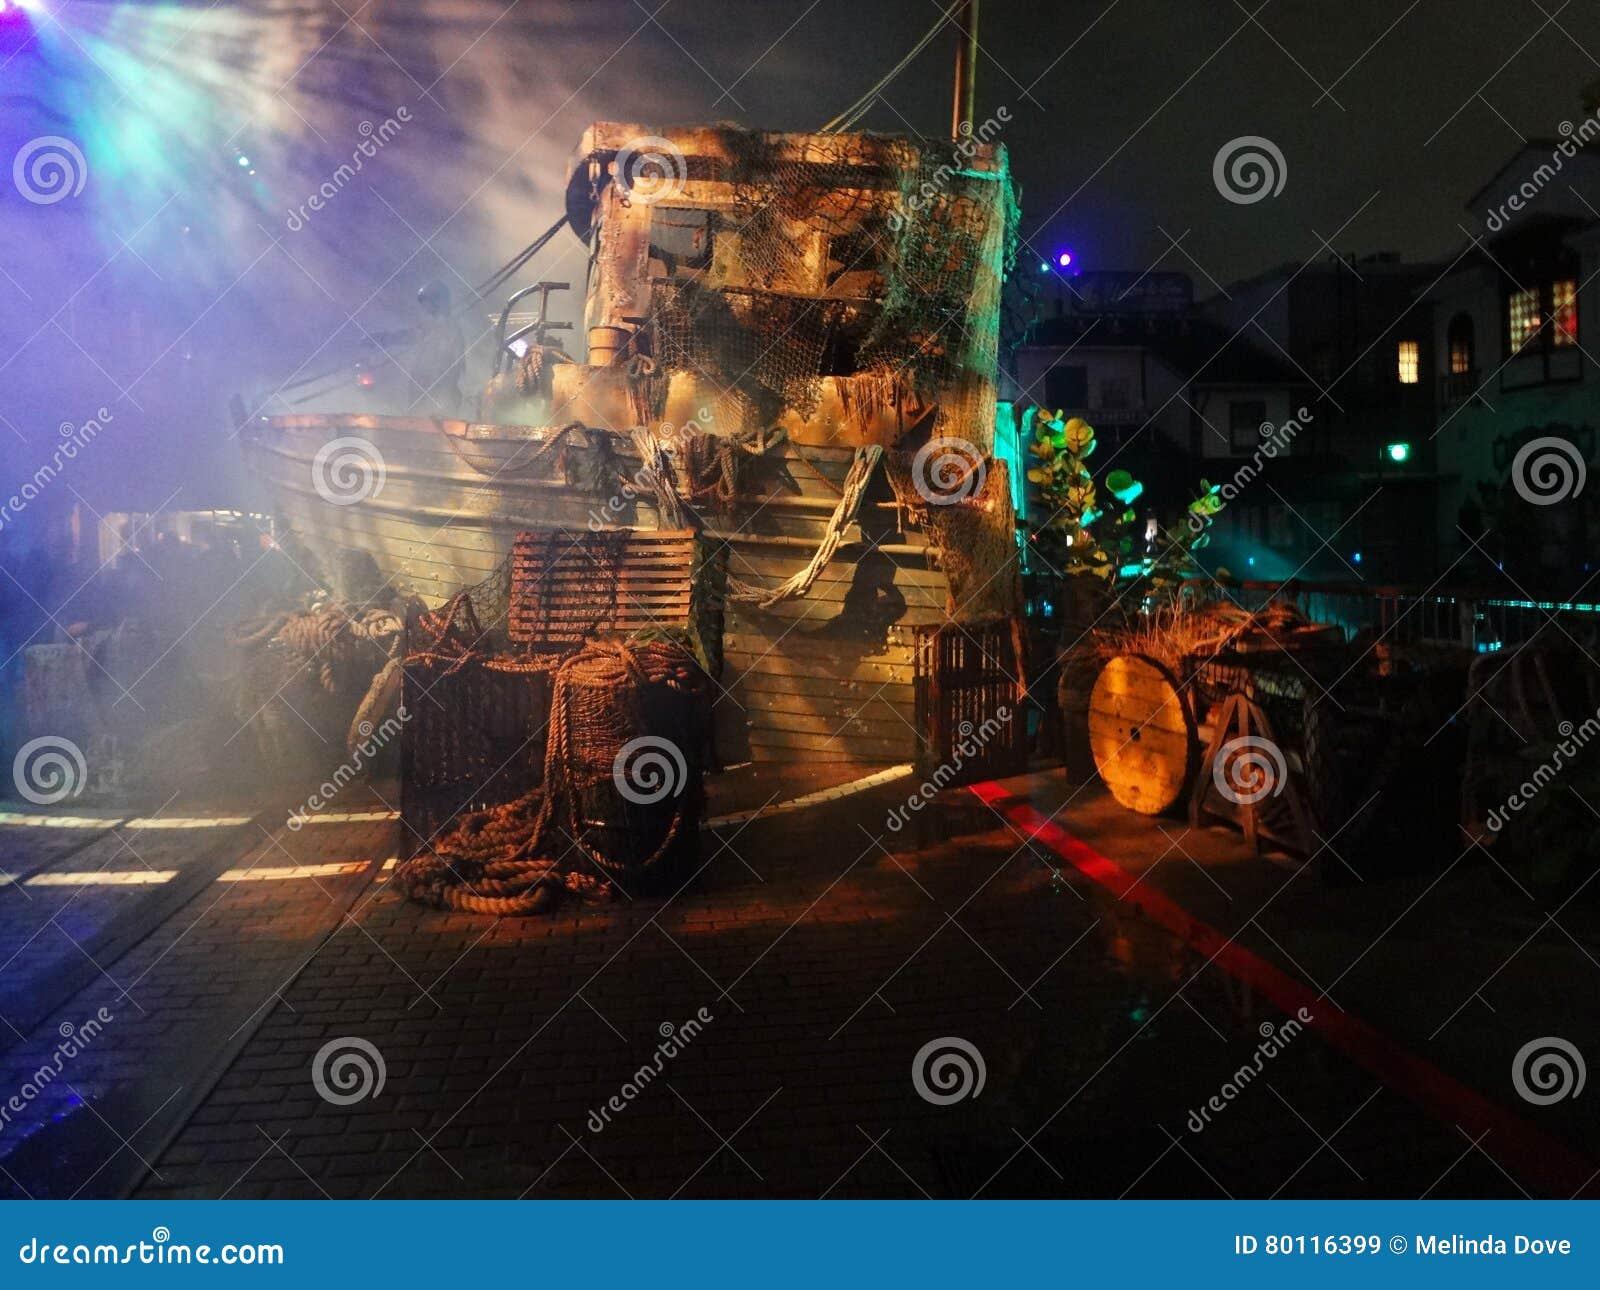 Dead Man s Wharf Scare Zone and HHN 26